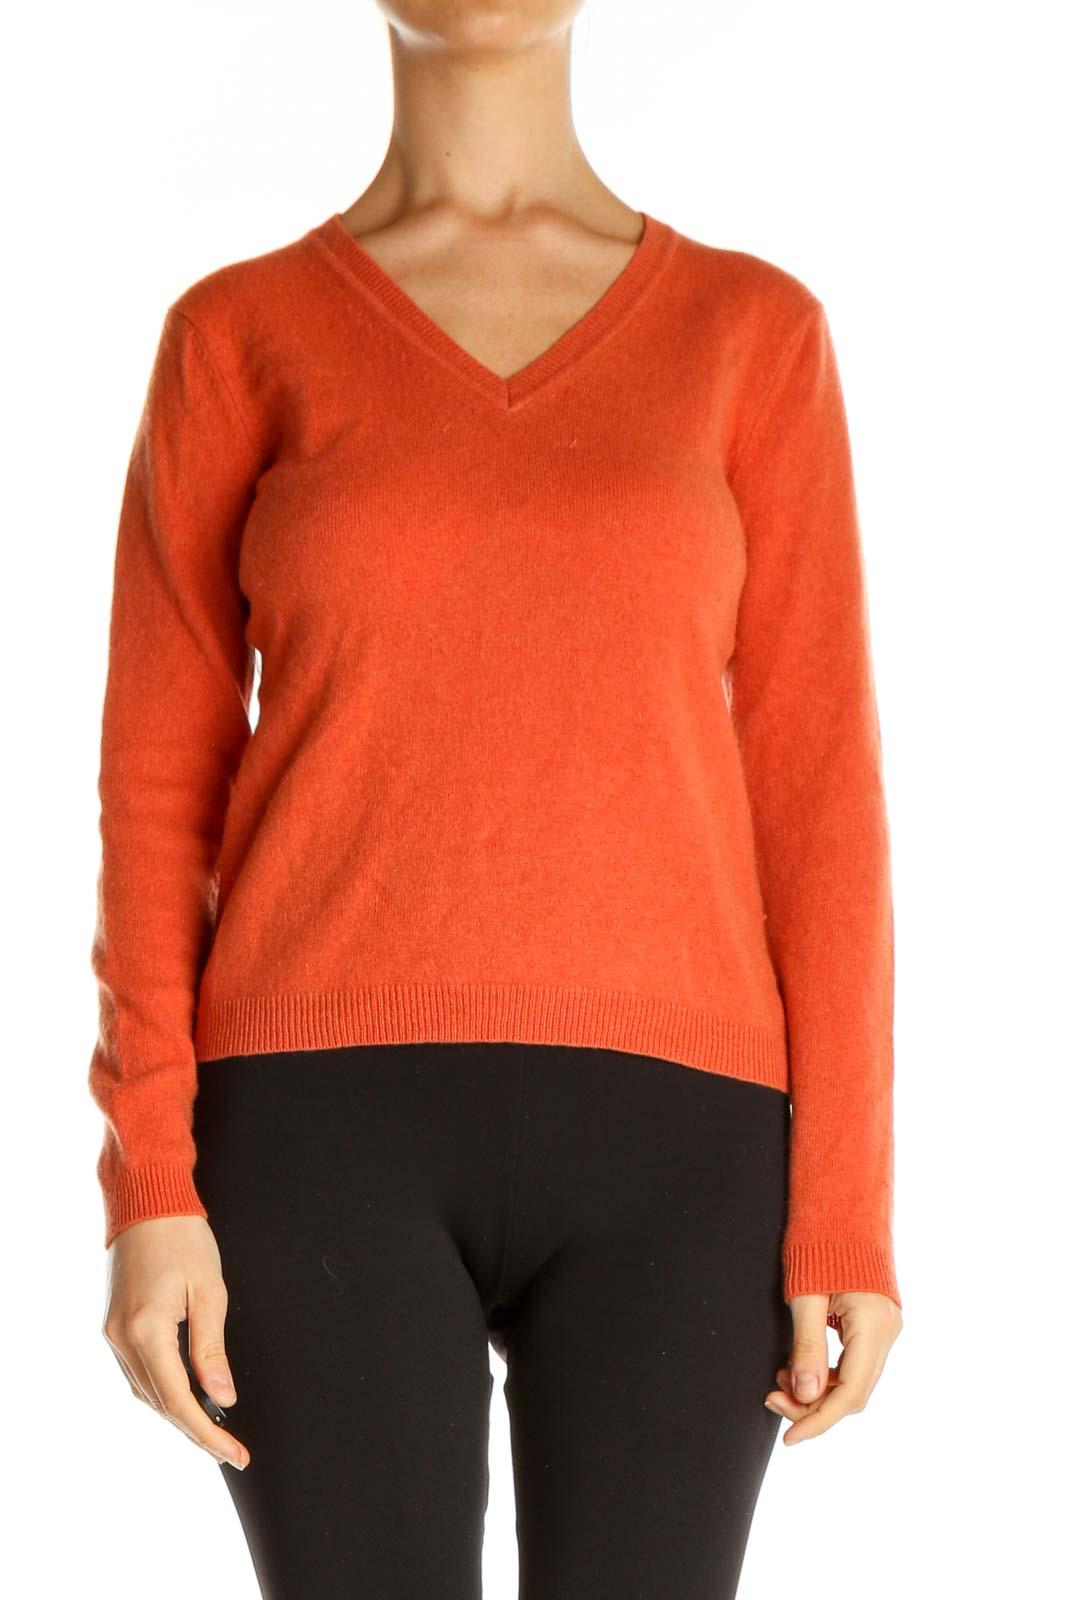 Orange All Day Wear Sweater Front